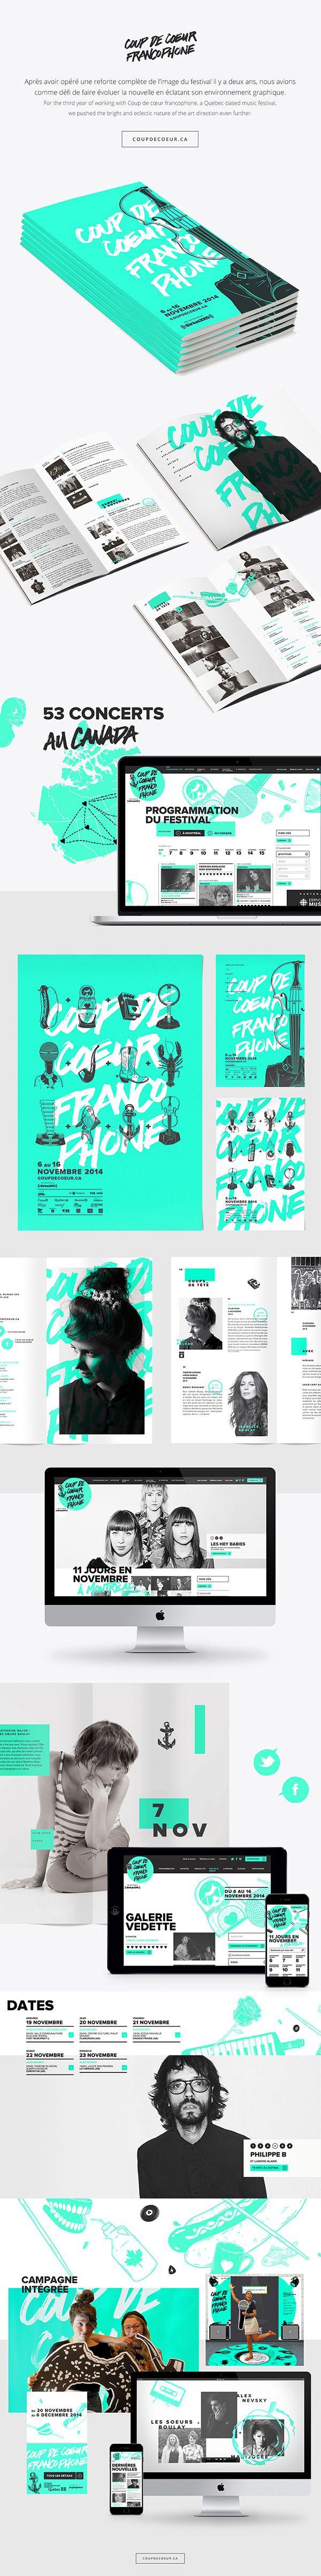 Coup de cœur francophone 2014 on Branding Served                                                                                                                                                                                 More